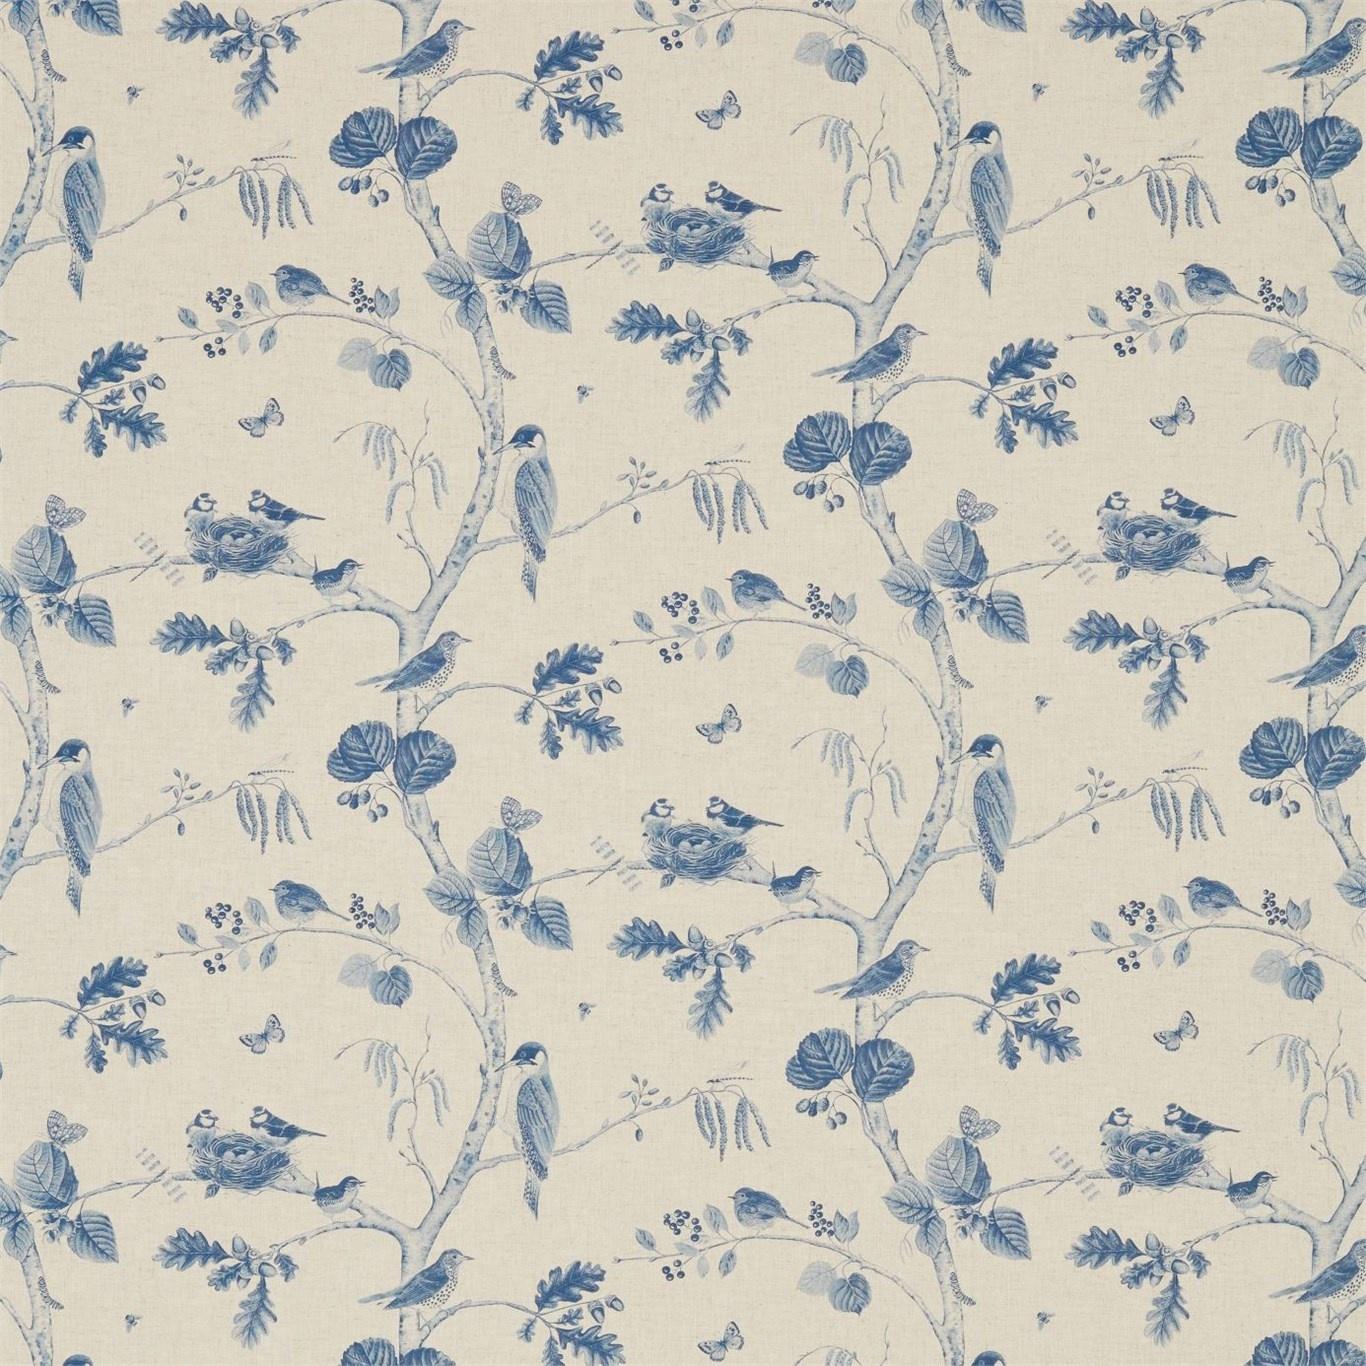 Image of Sanderson Woodland Chorus Indigo/Linen Fabric 225510